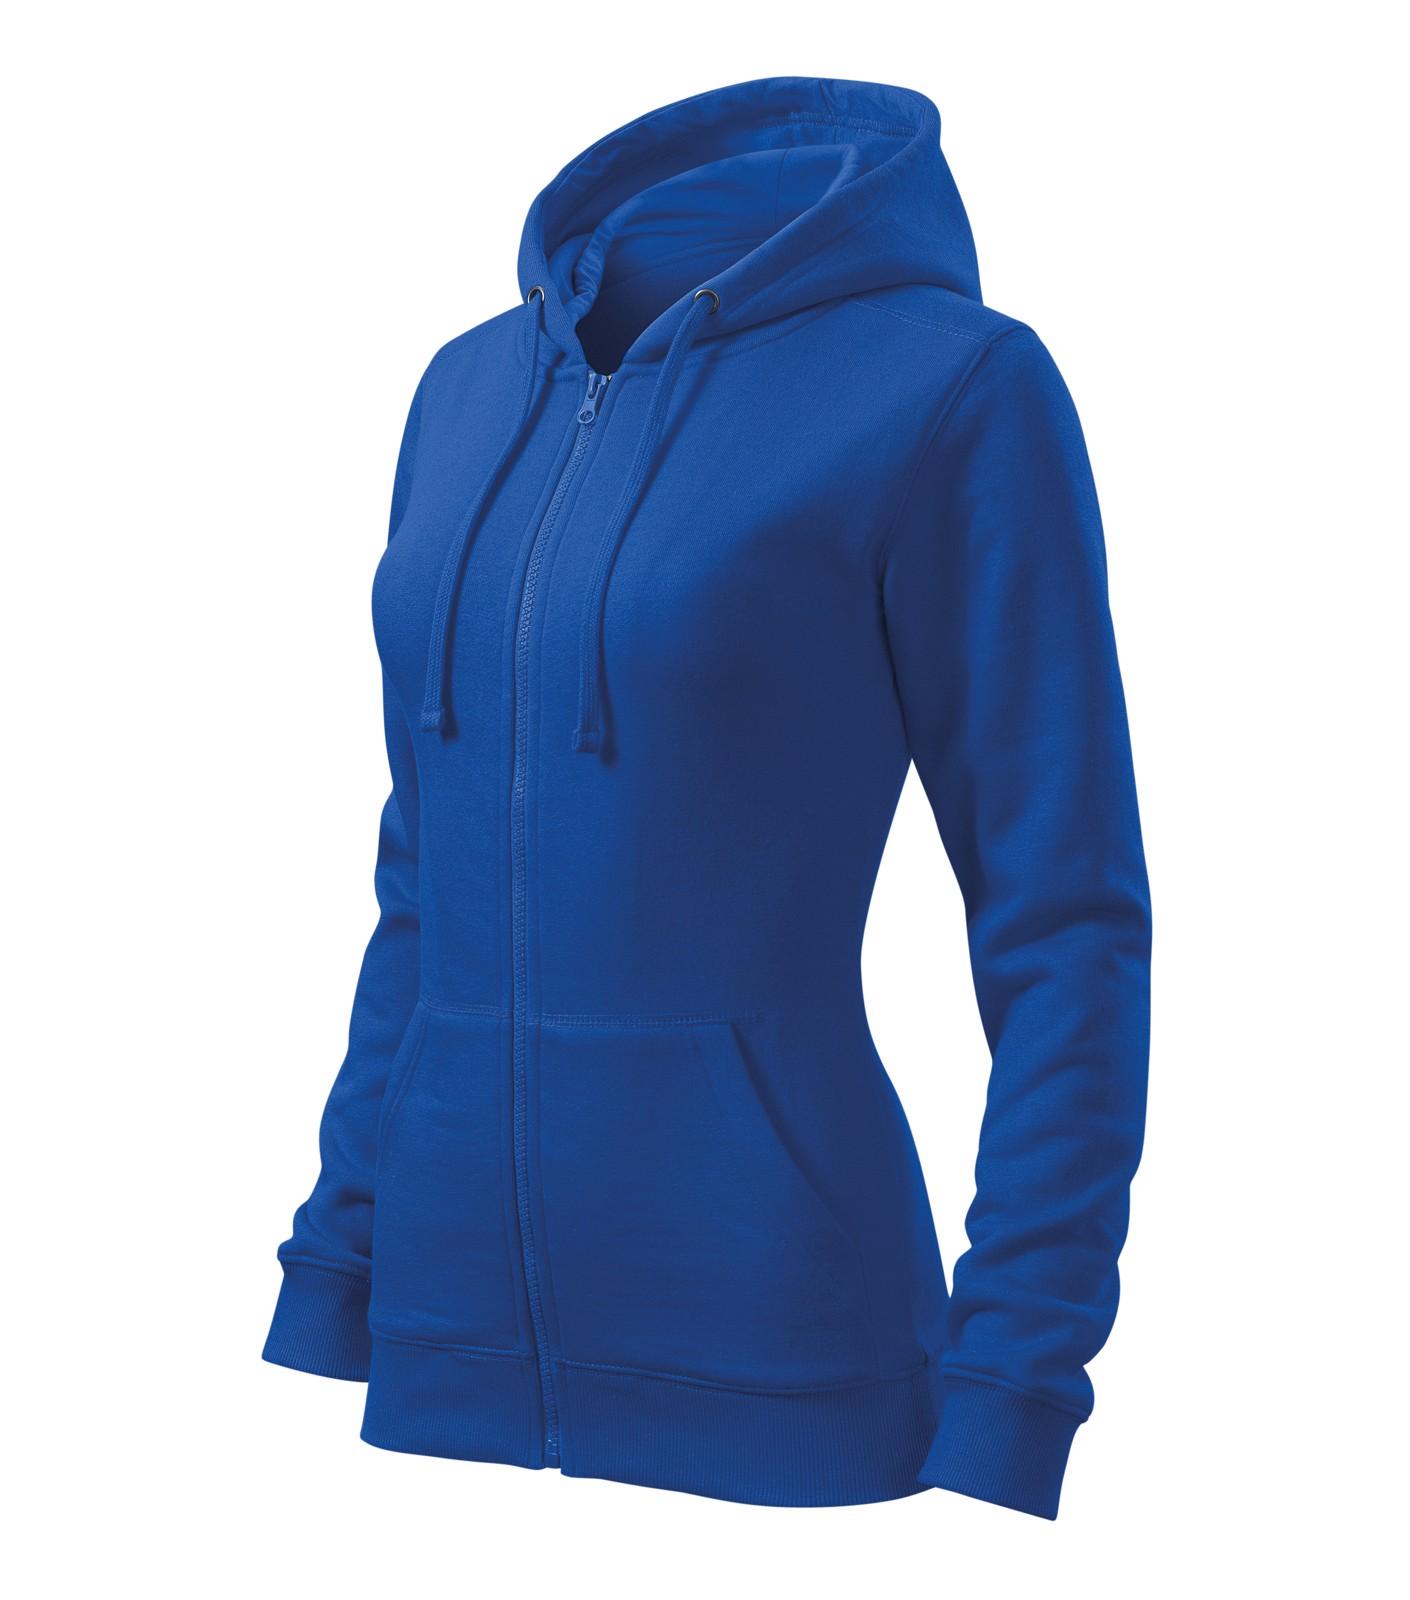 Sweatshirt women's Malfini Trendy Zipper - Royal Blue / S